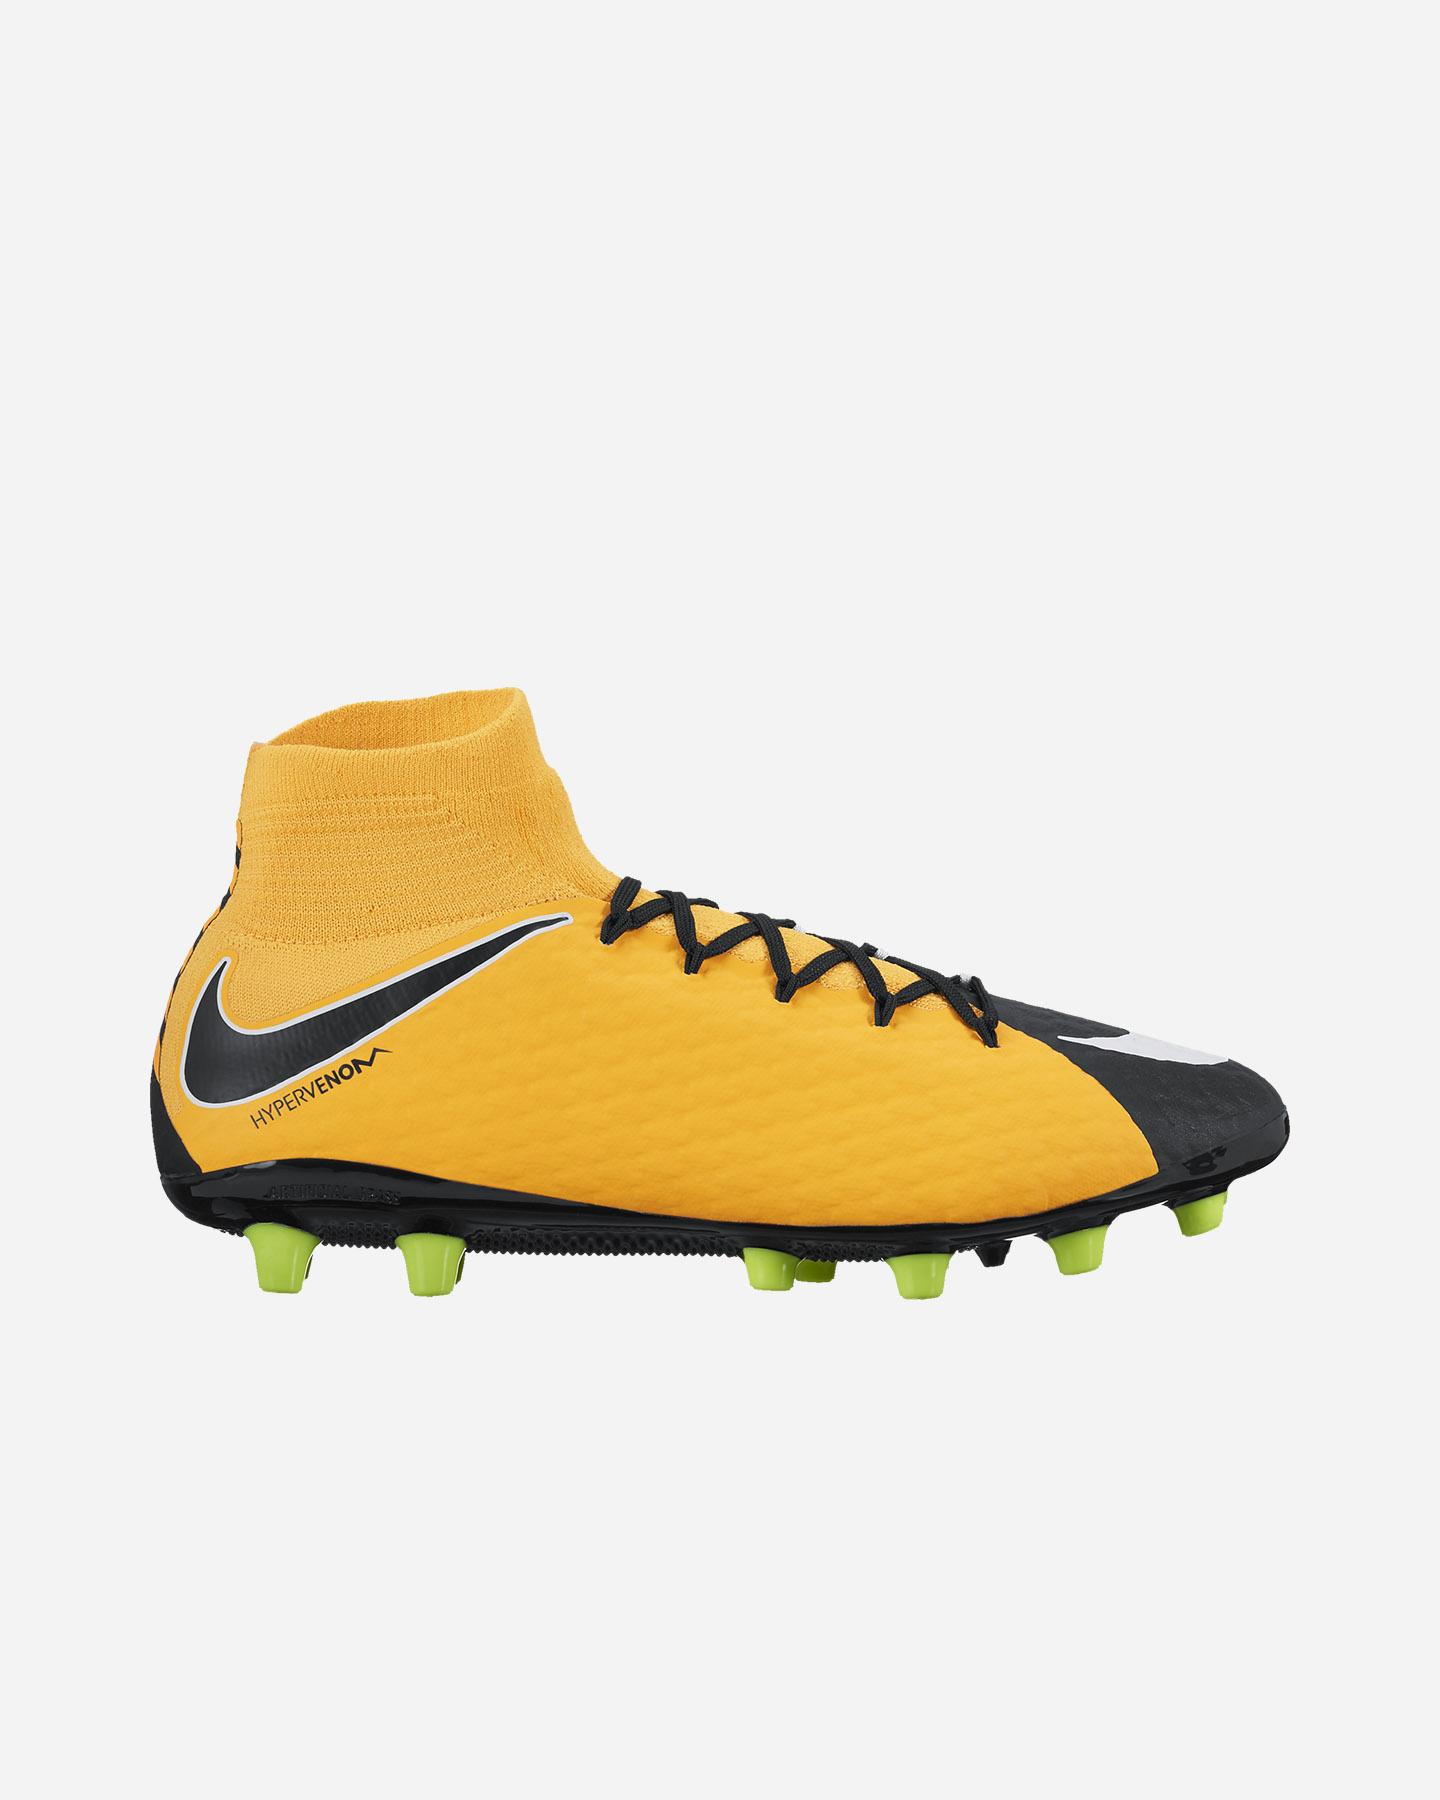 Ag Su Nike Scarpe Pro Hypervenom Phatal Iii Calcio 860644 M qUBzt